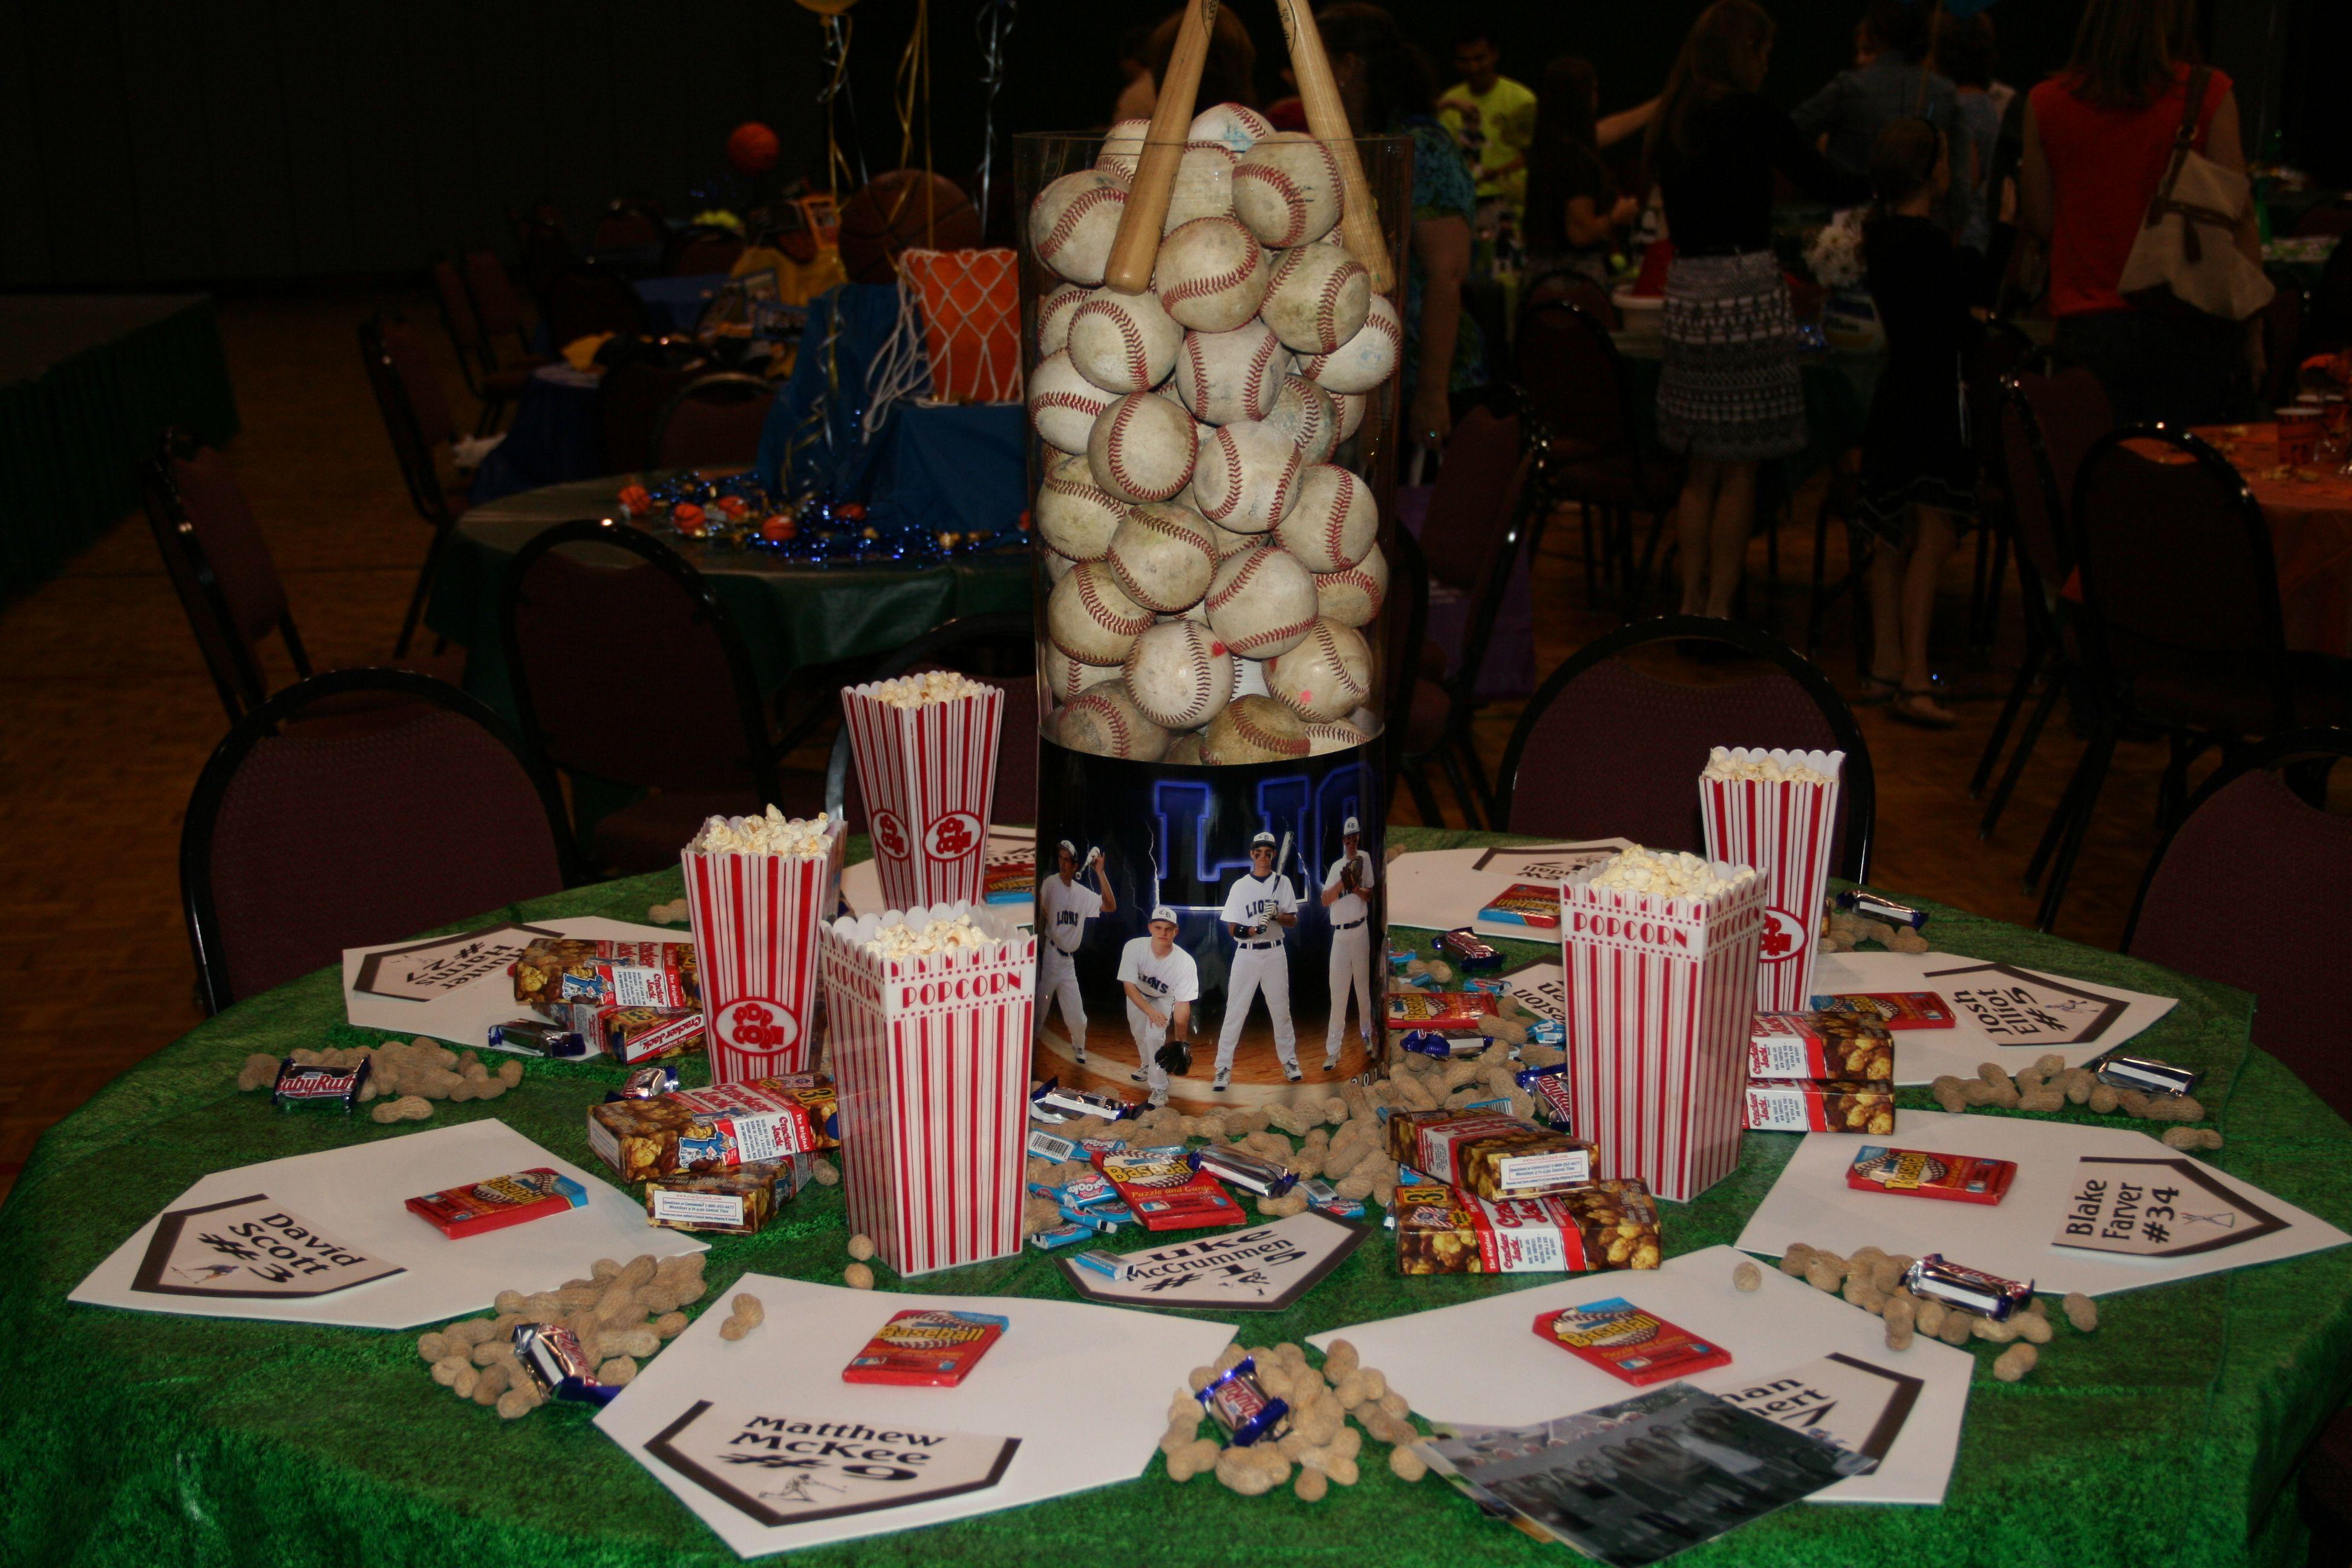 Baseball Banquet Table To Baseball Baseball Theme Party